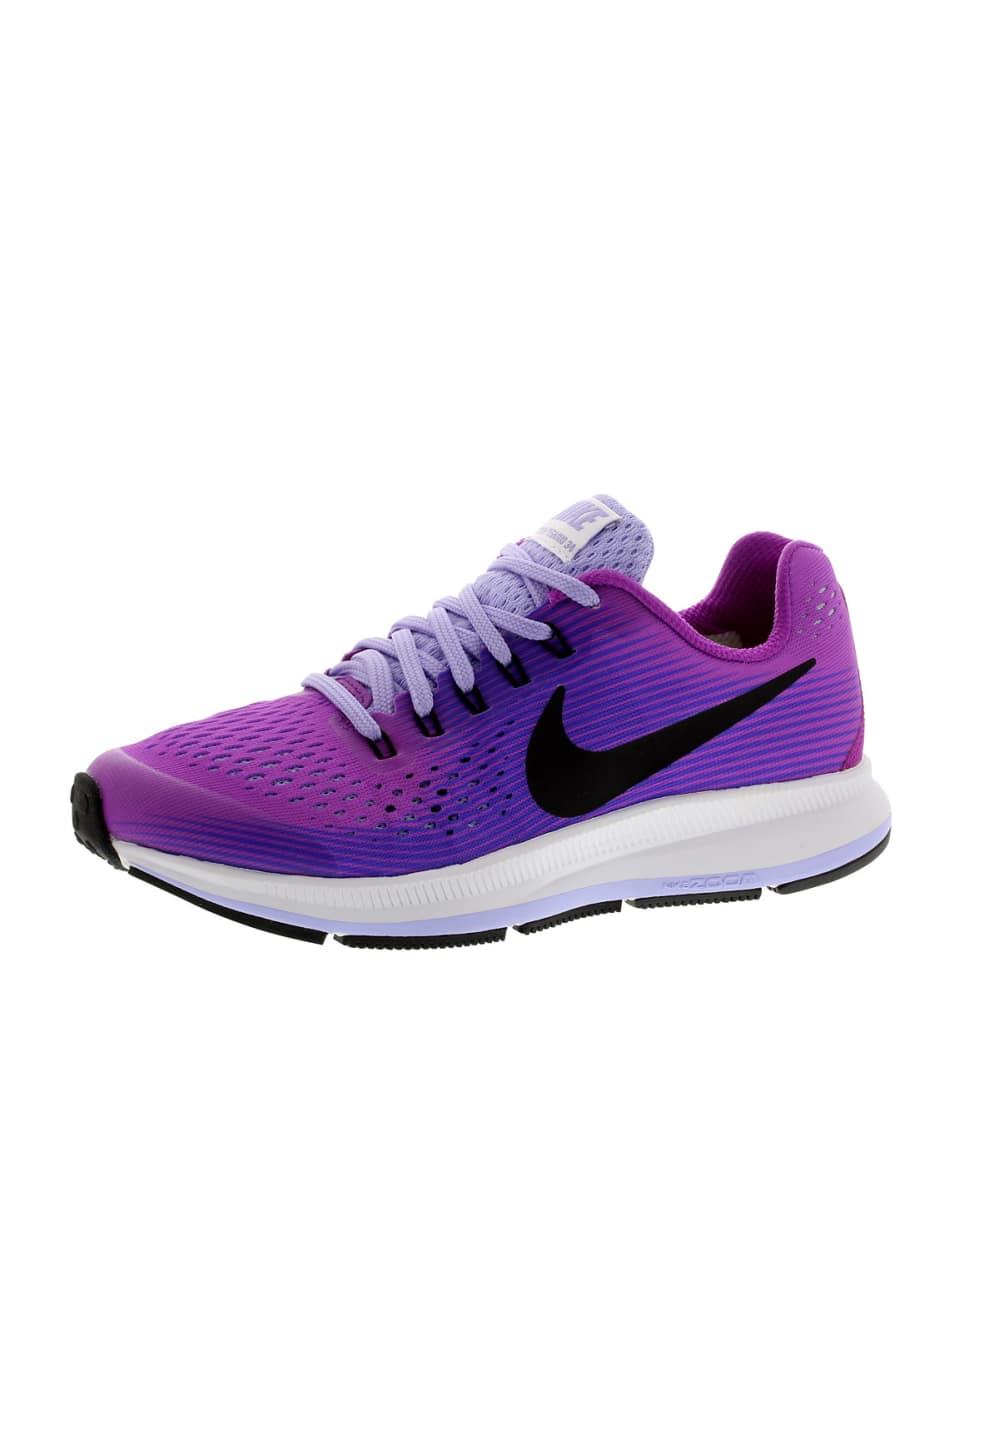 Nike Zoom Pegasus 34 GS Girls Chaussures running Violet